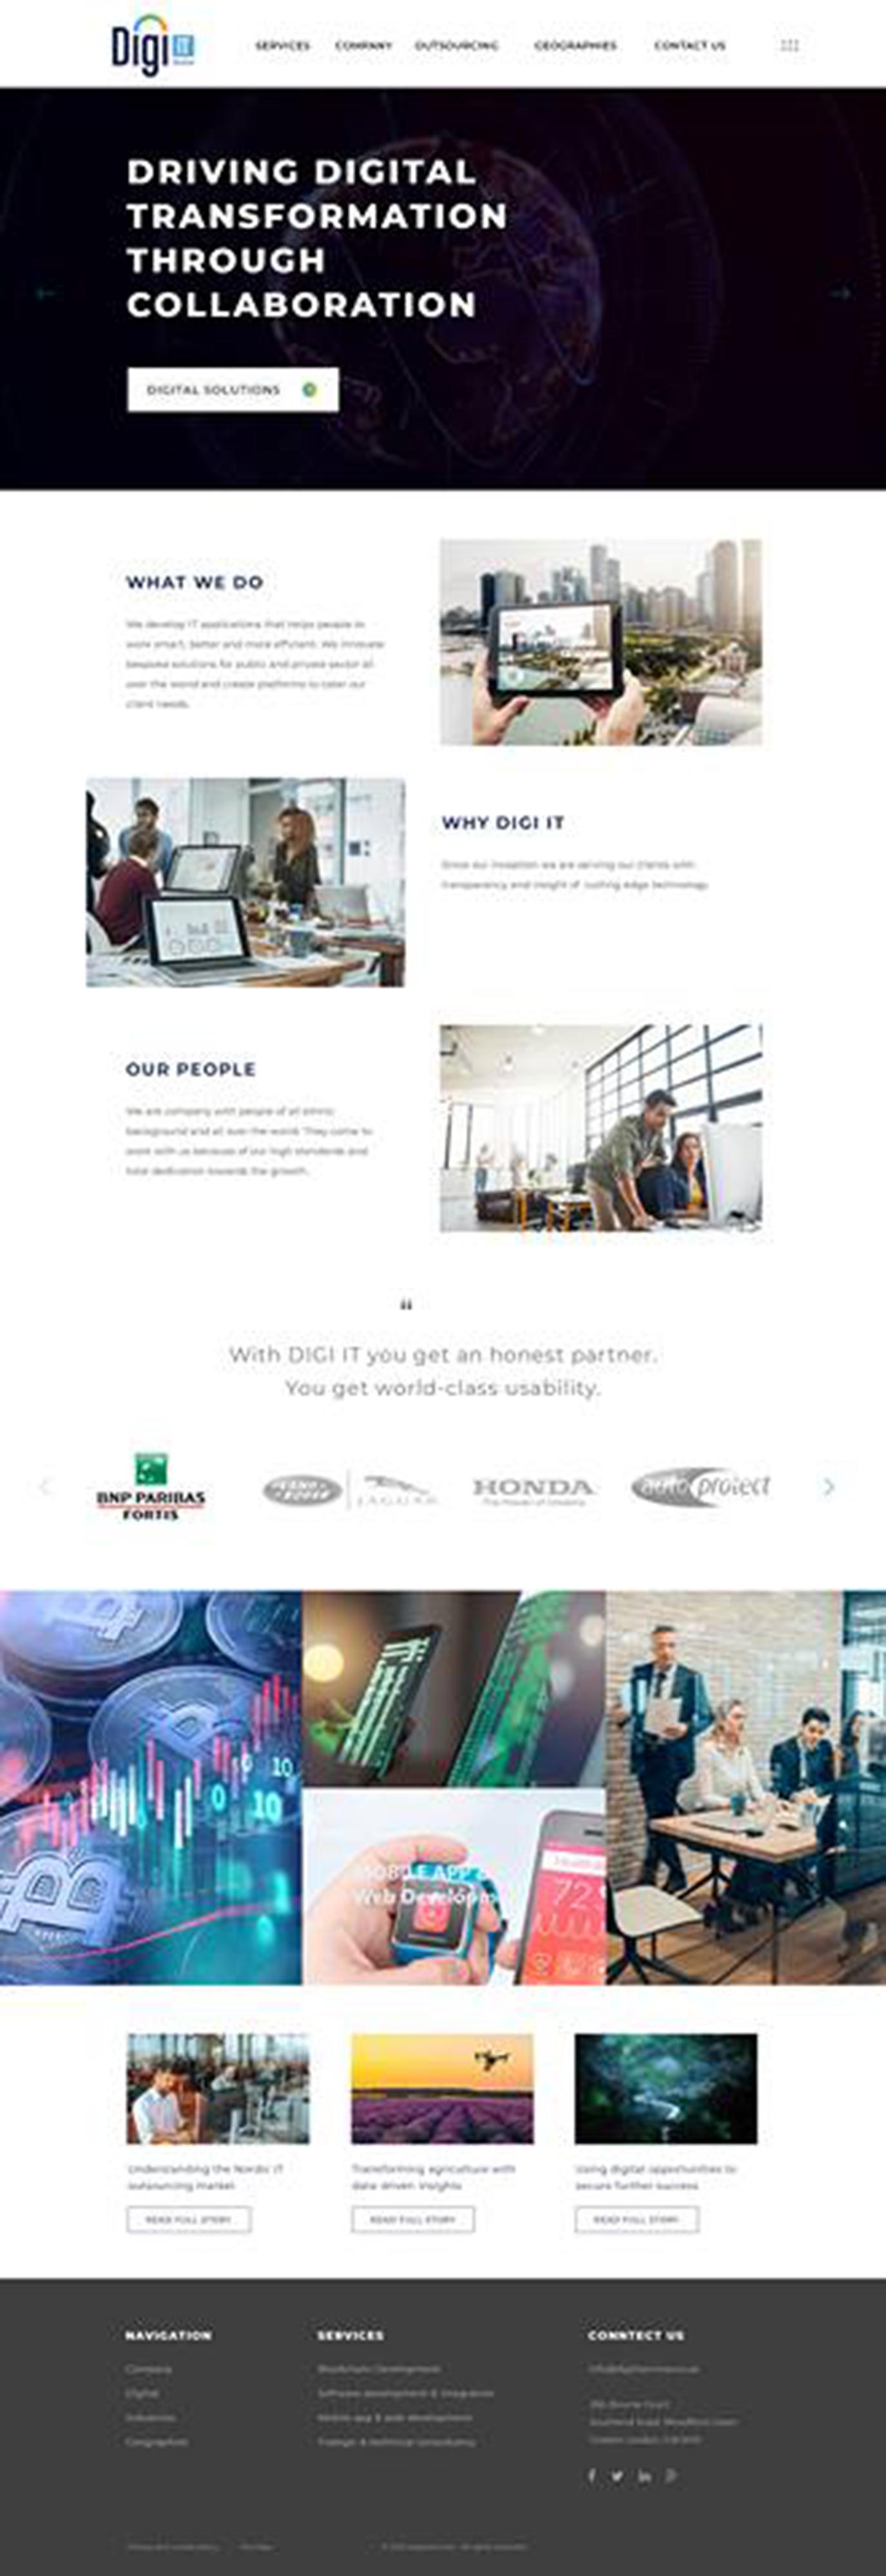 Web Design London Web Design London Web Design Web Design Services